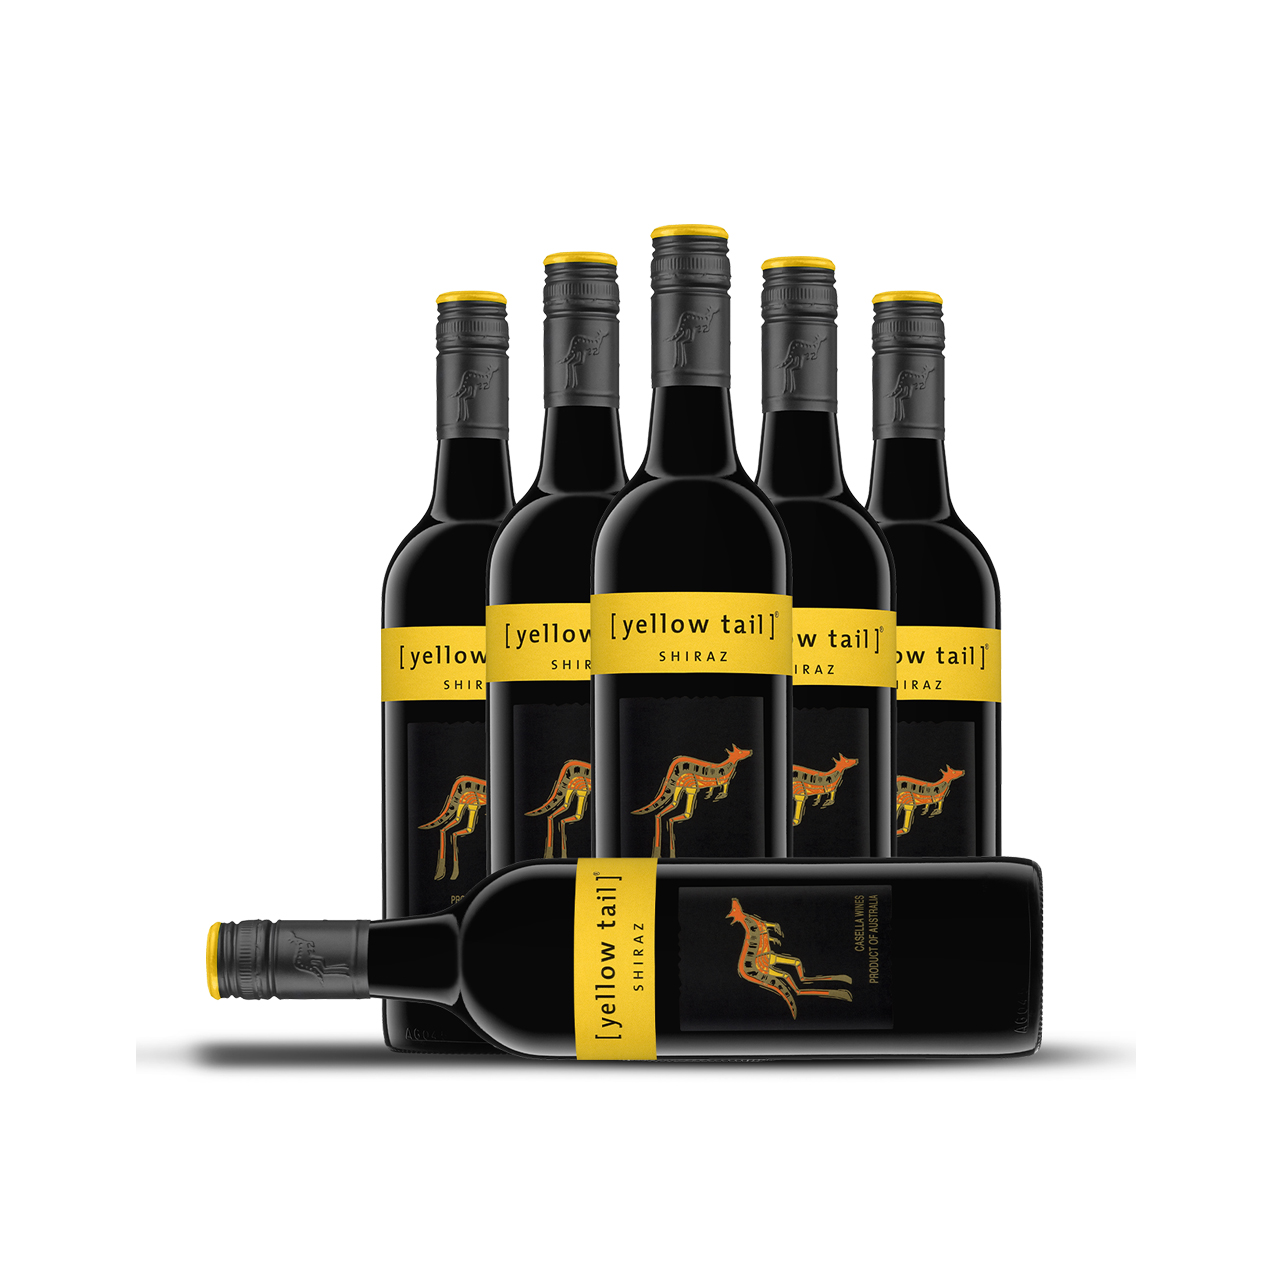 黃尾袋鼠葡萄酒